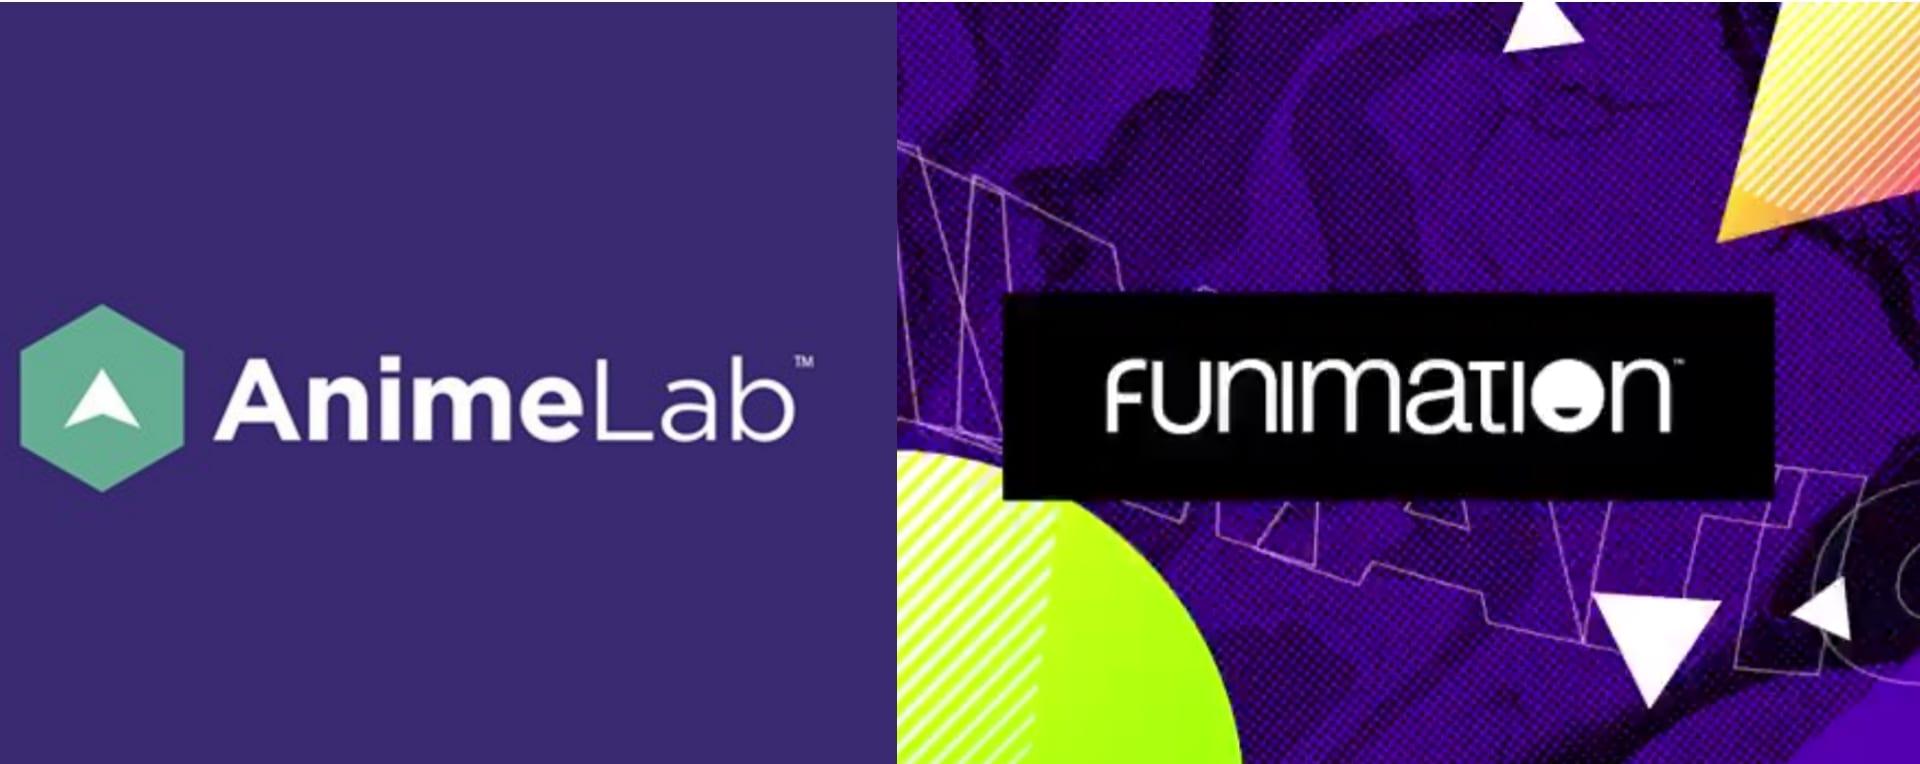 funimation acquires animelab